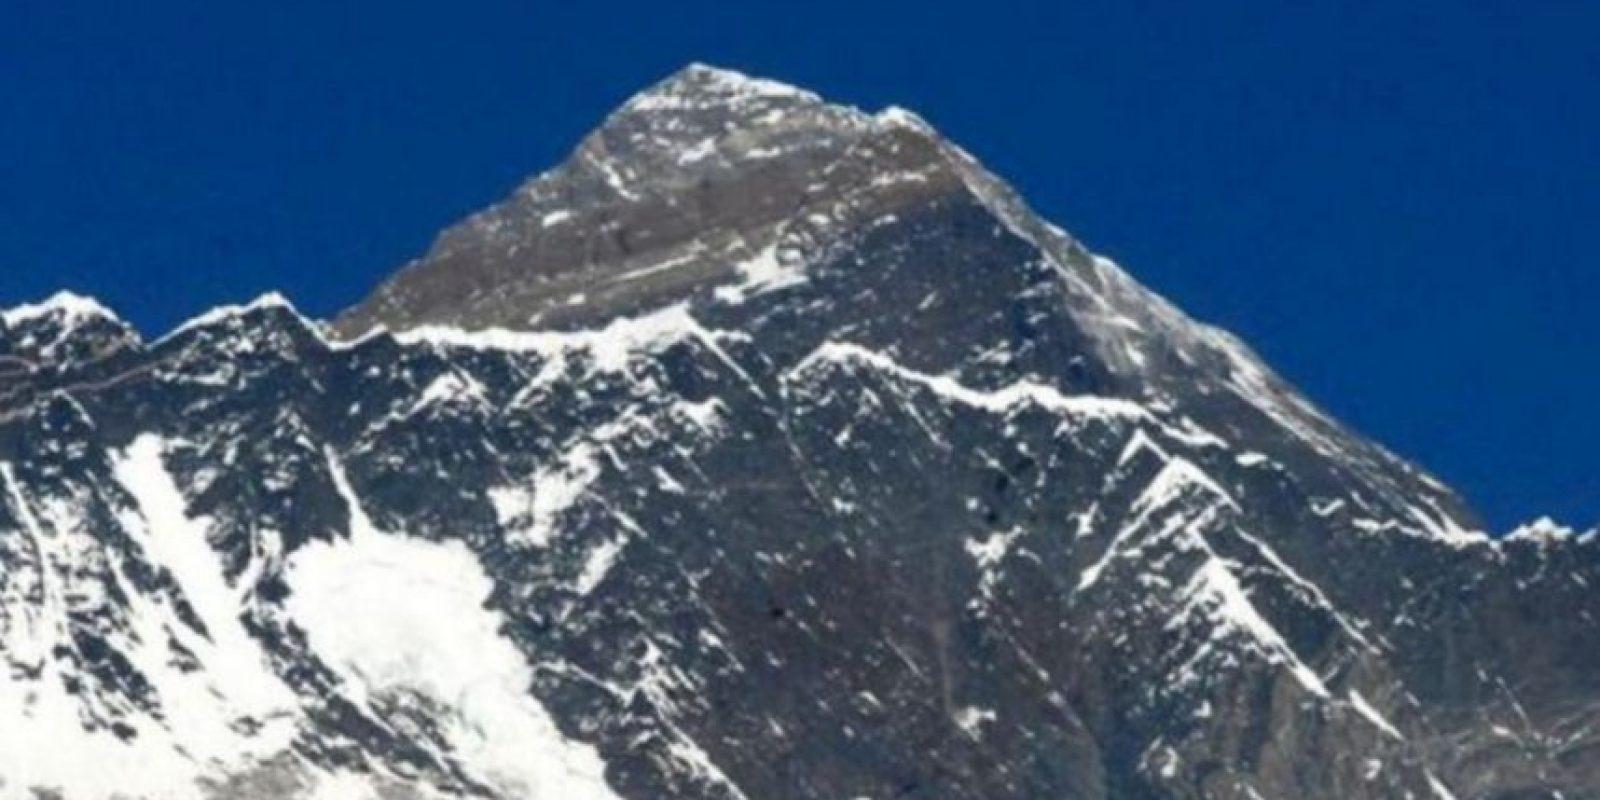 Vista del Everest, de 8.848 metros, desde Syangboche (Nepal), a 3.800 metros de altitud. Foto:Getty Images